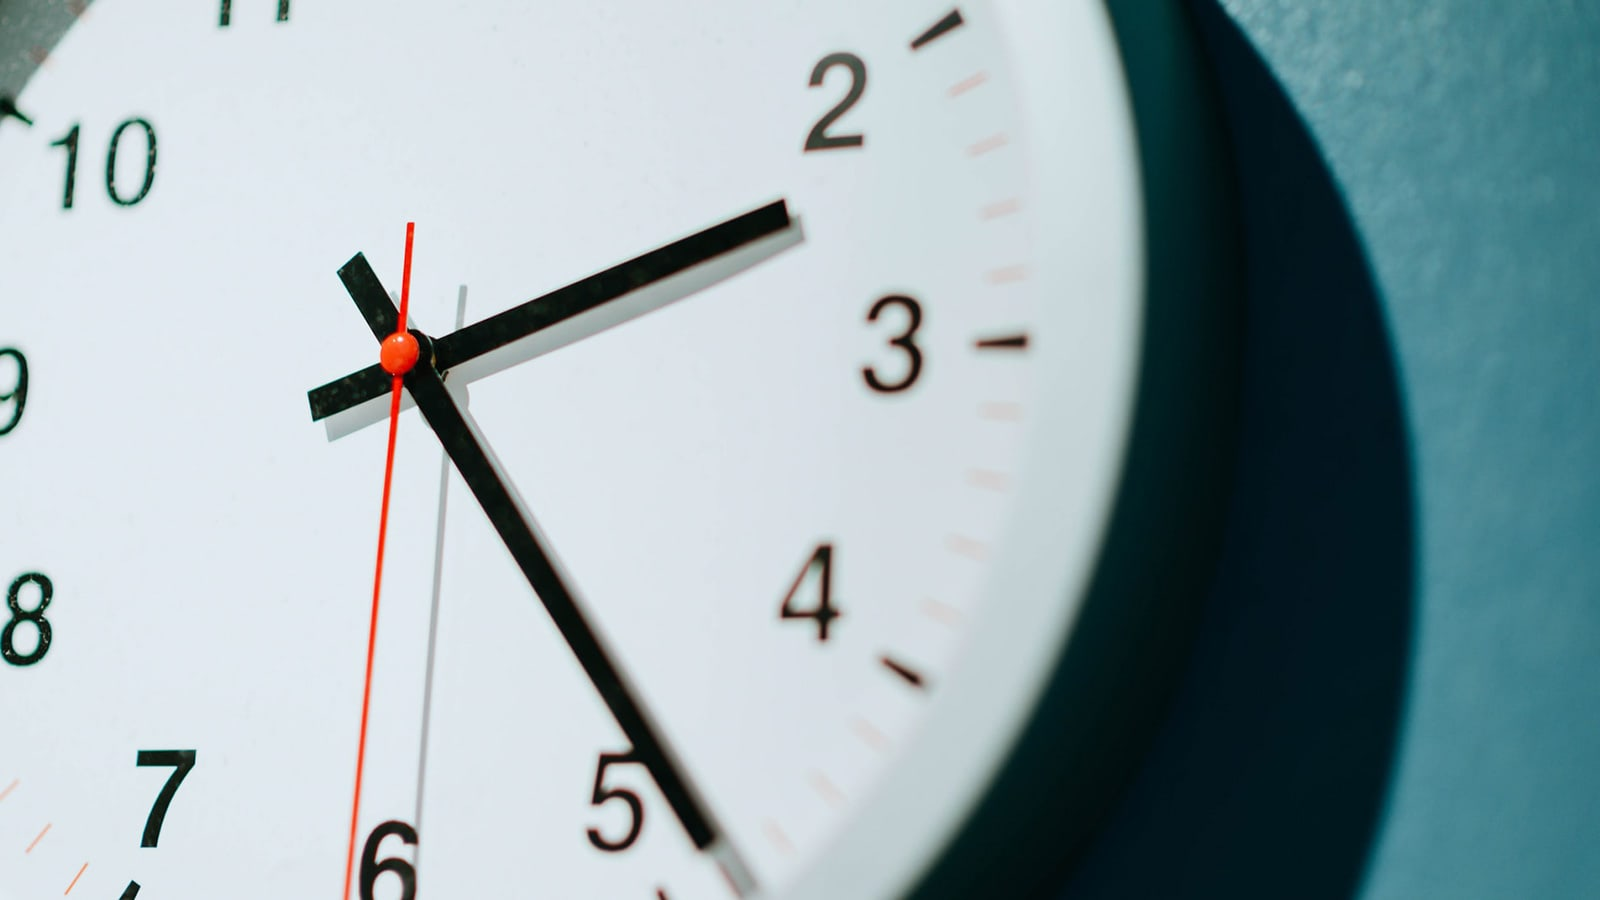 How long should an air scrubber be run